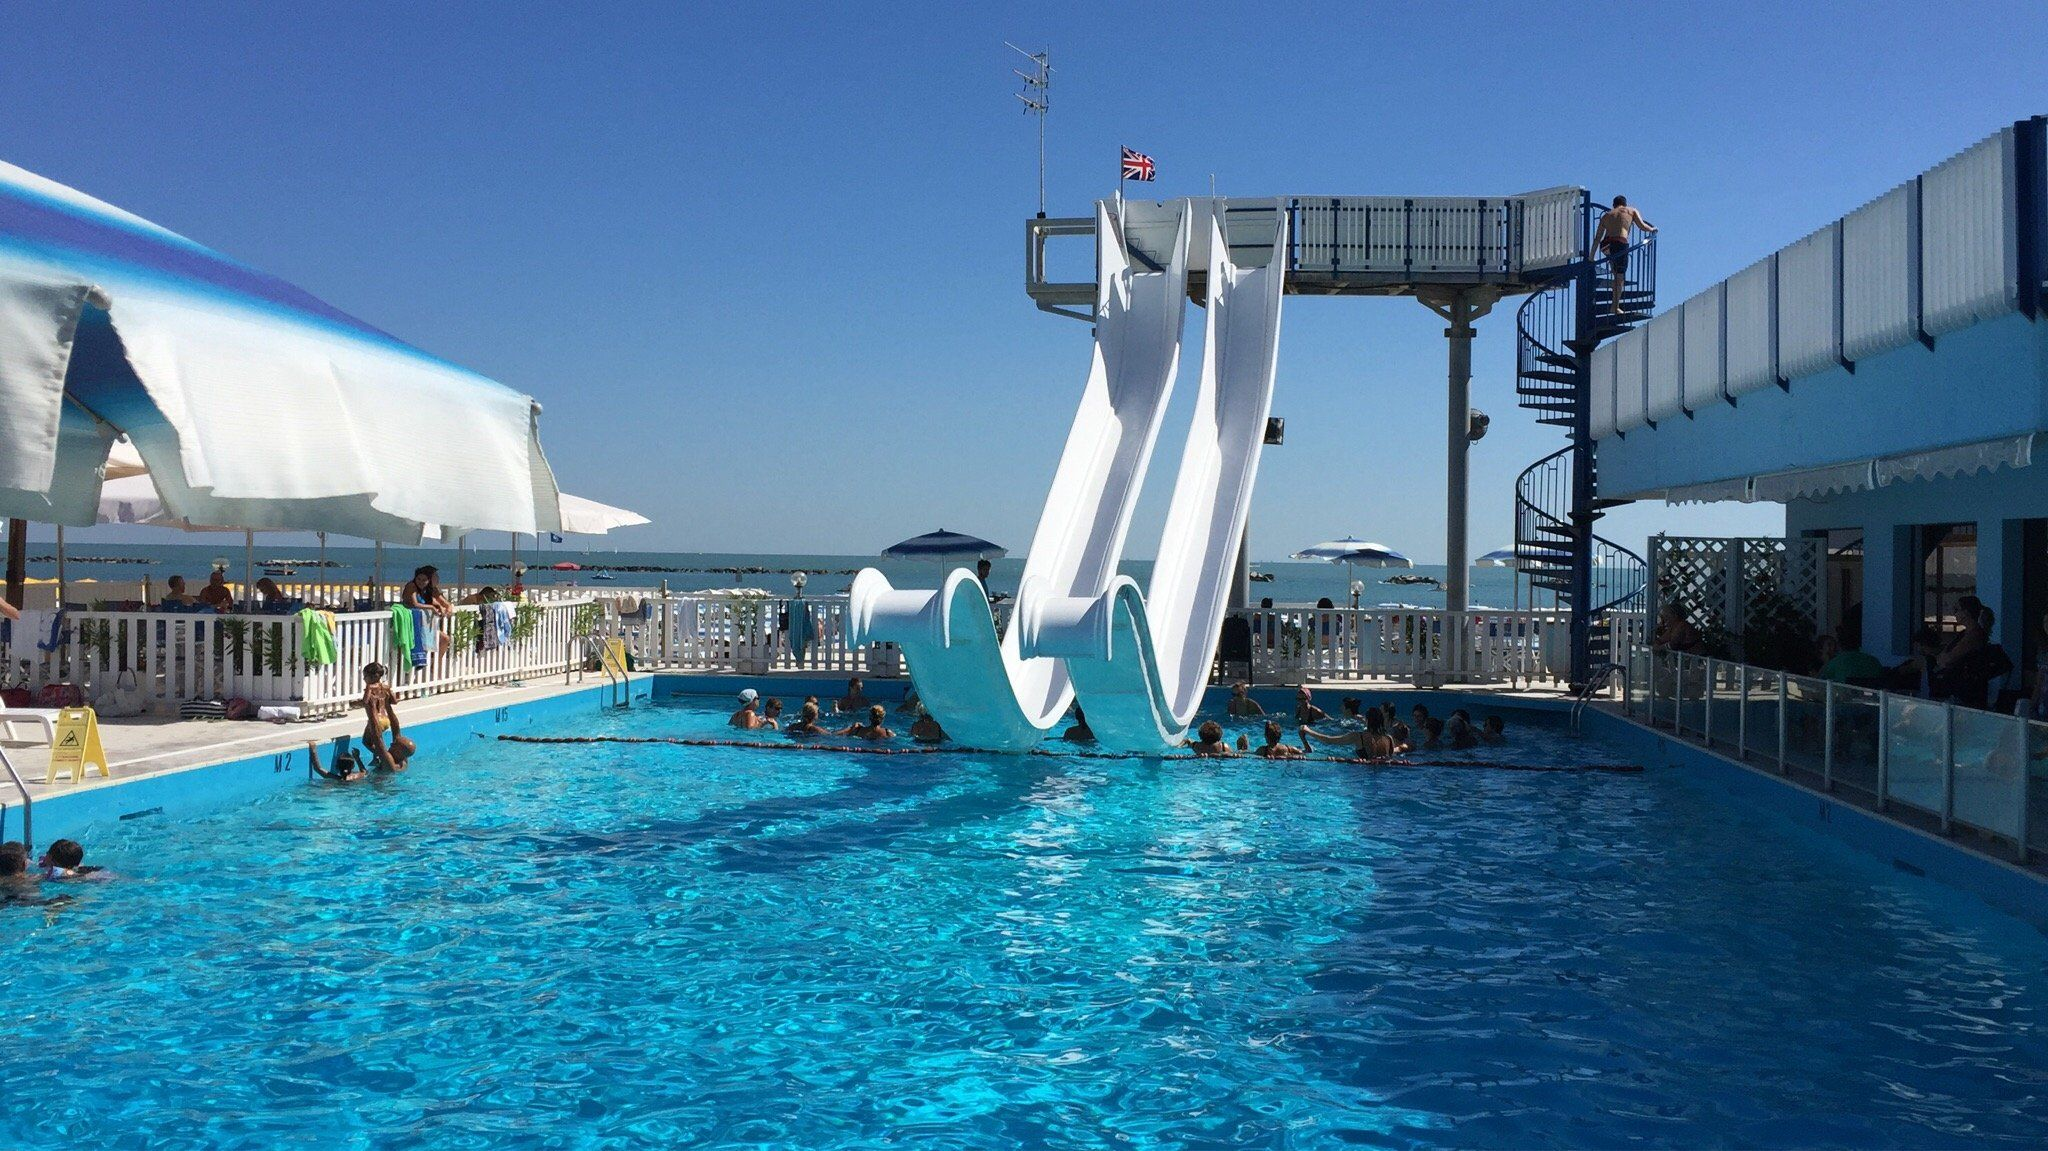 Bagno Piscina 4 Venti 59/60 Trip advisor, Travel, Marina